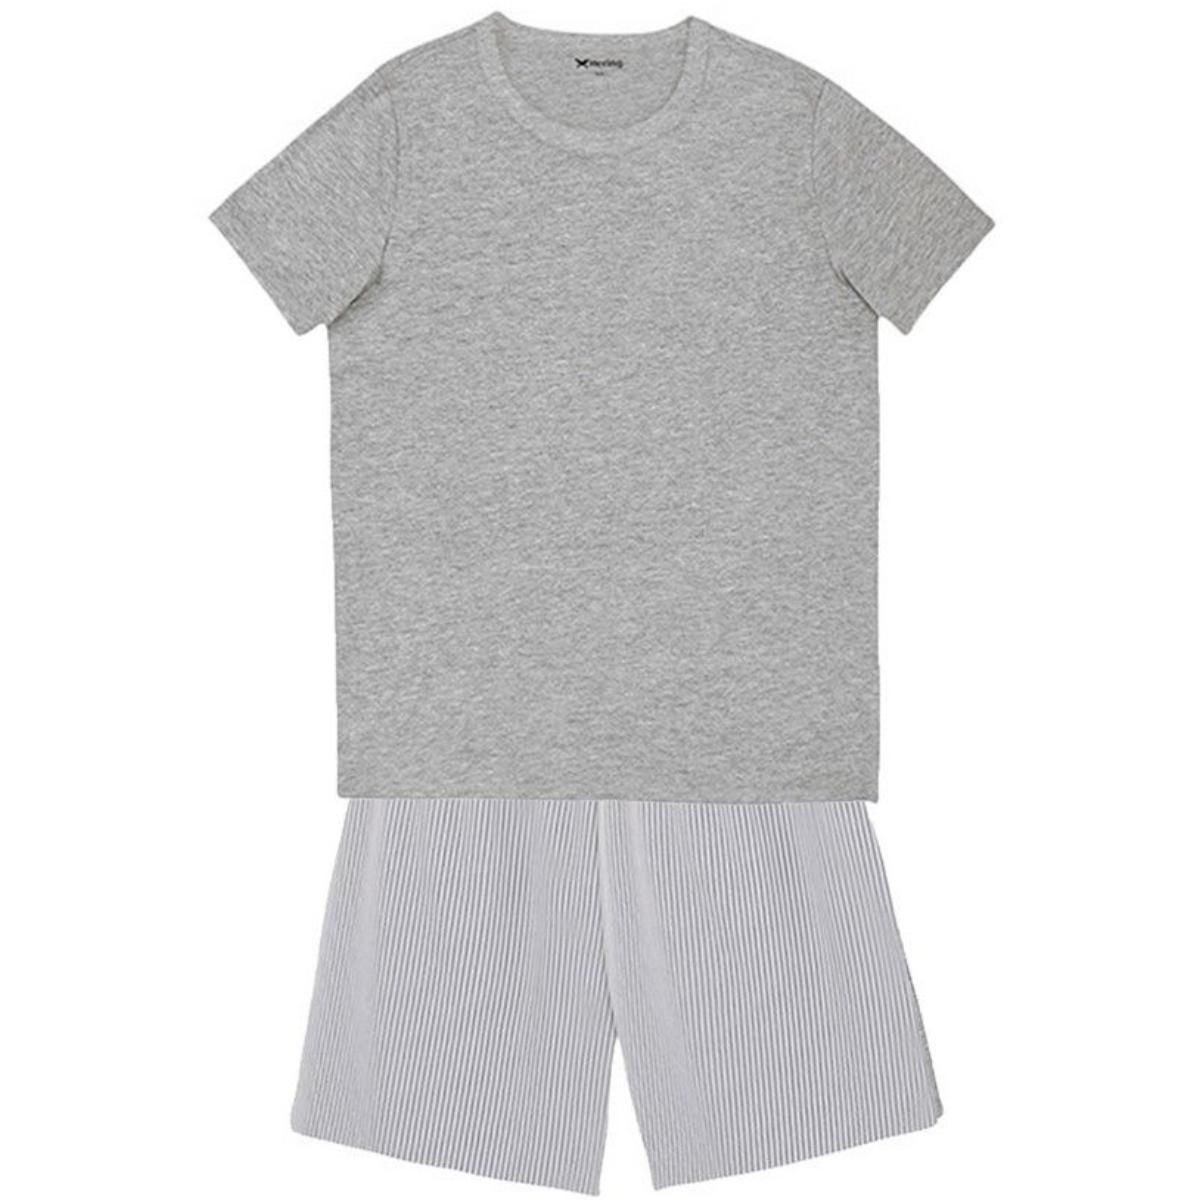 Pijama Masculina Hering Q8au Se01en Cinza